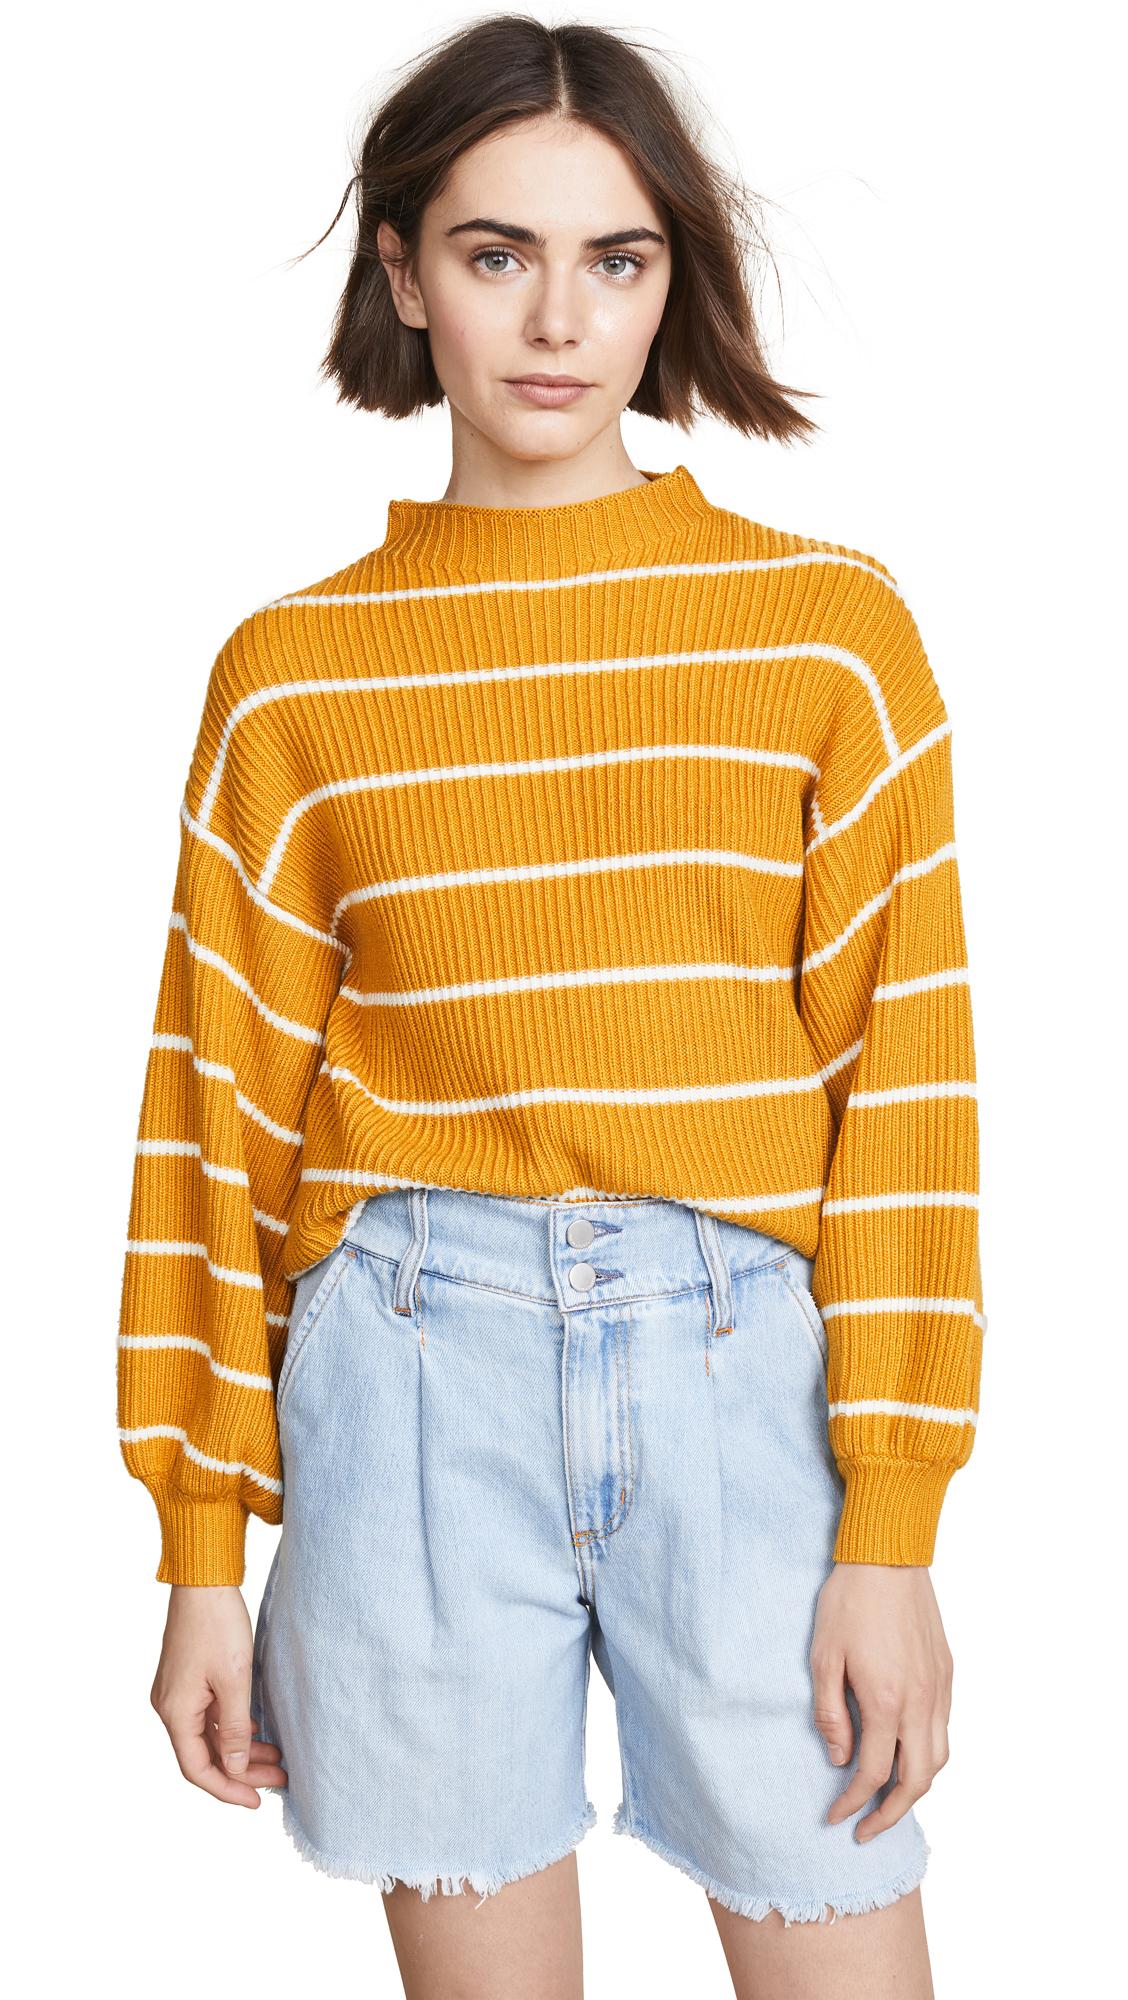 Saylor Bette Striped Mock Neck Sweater In Mustard